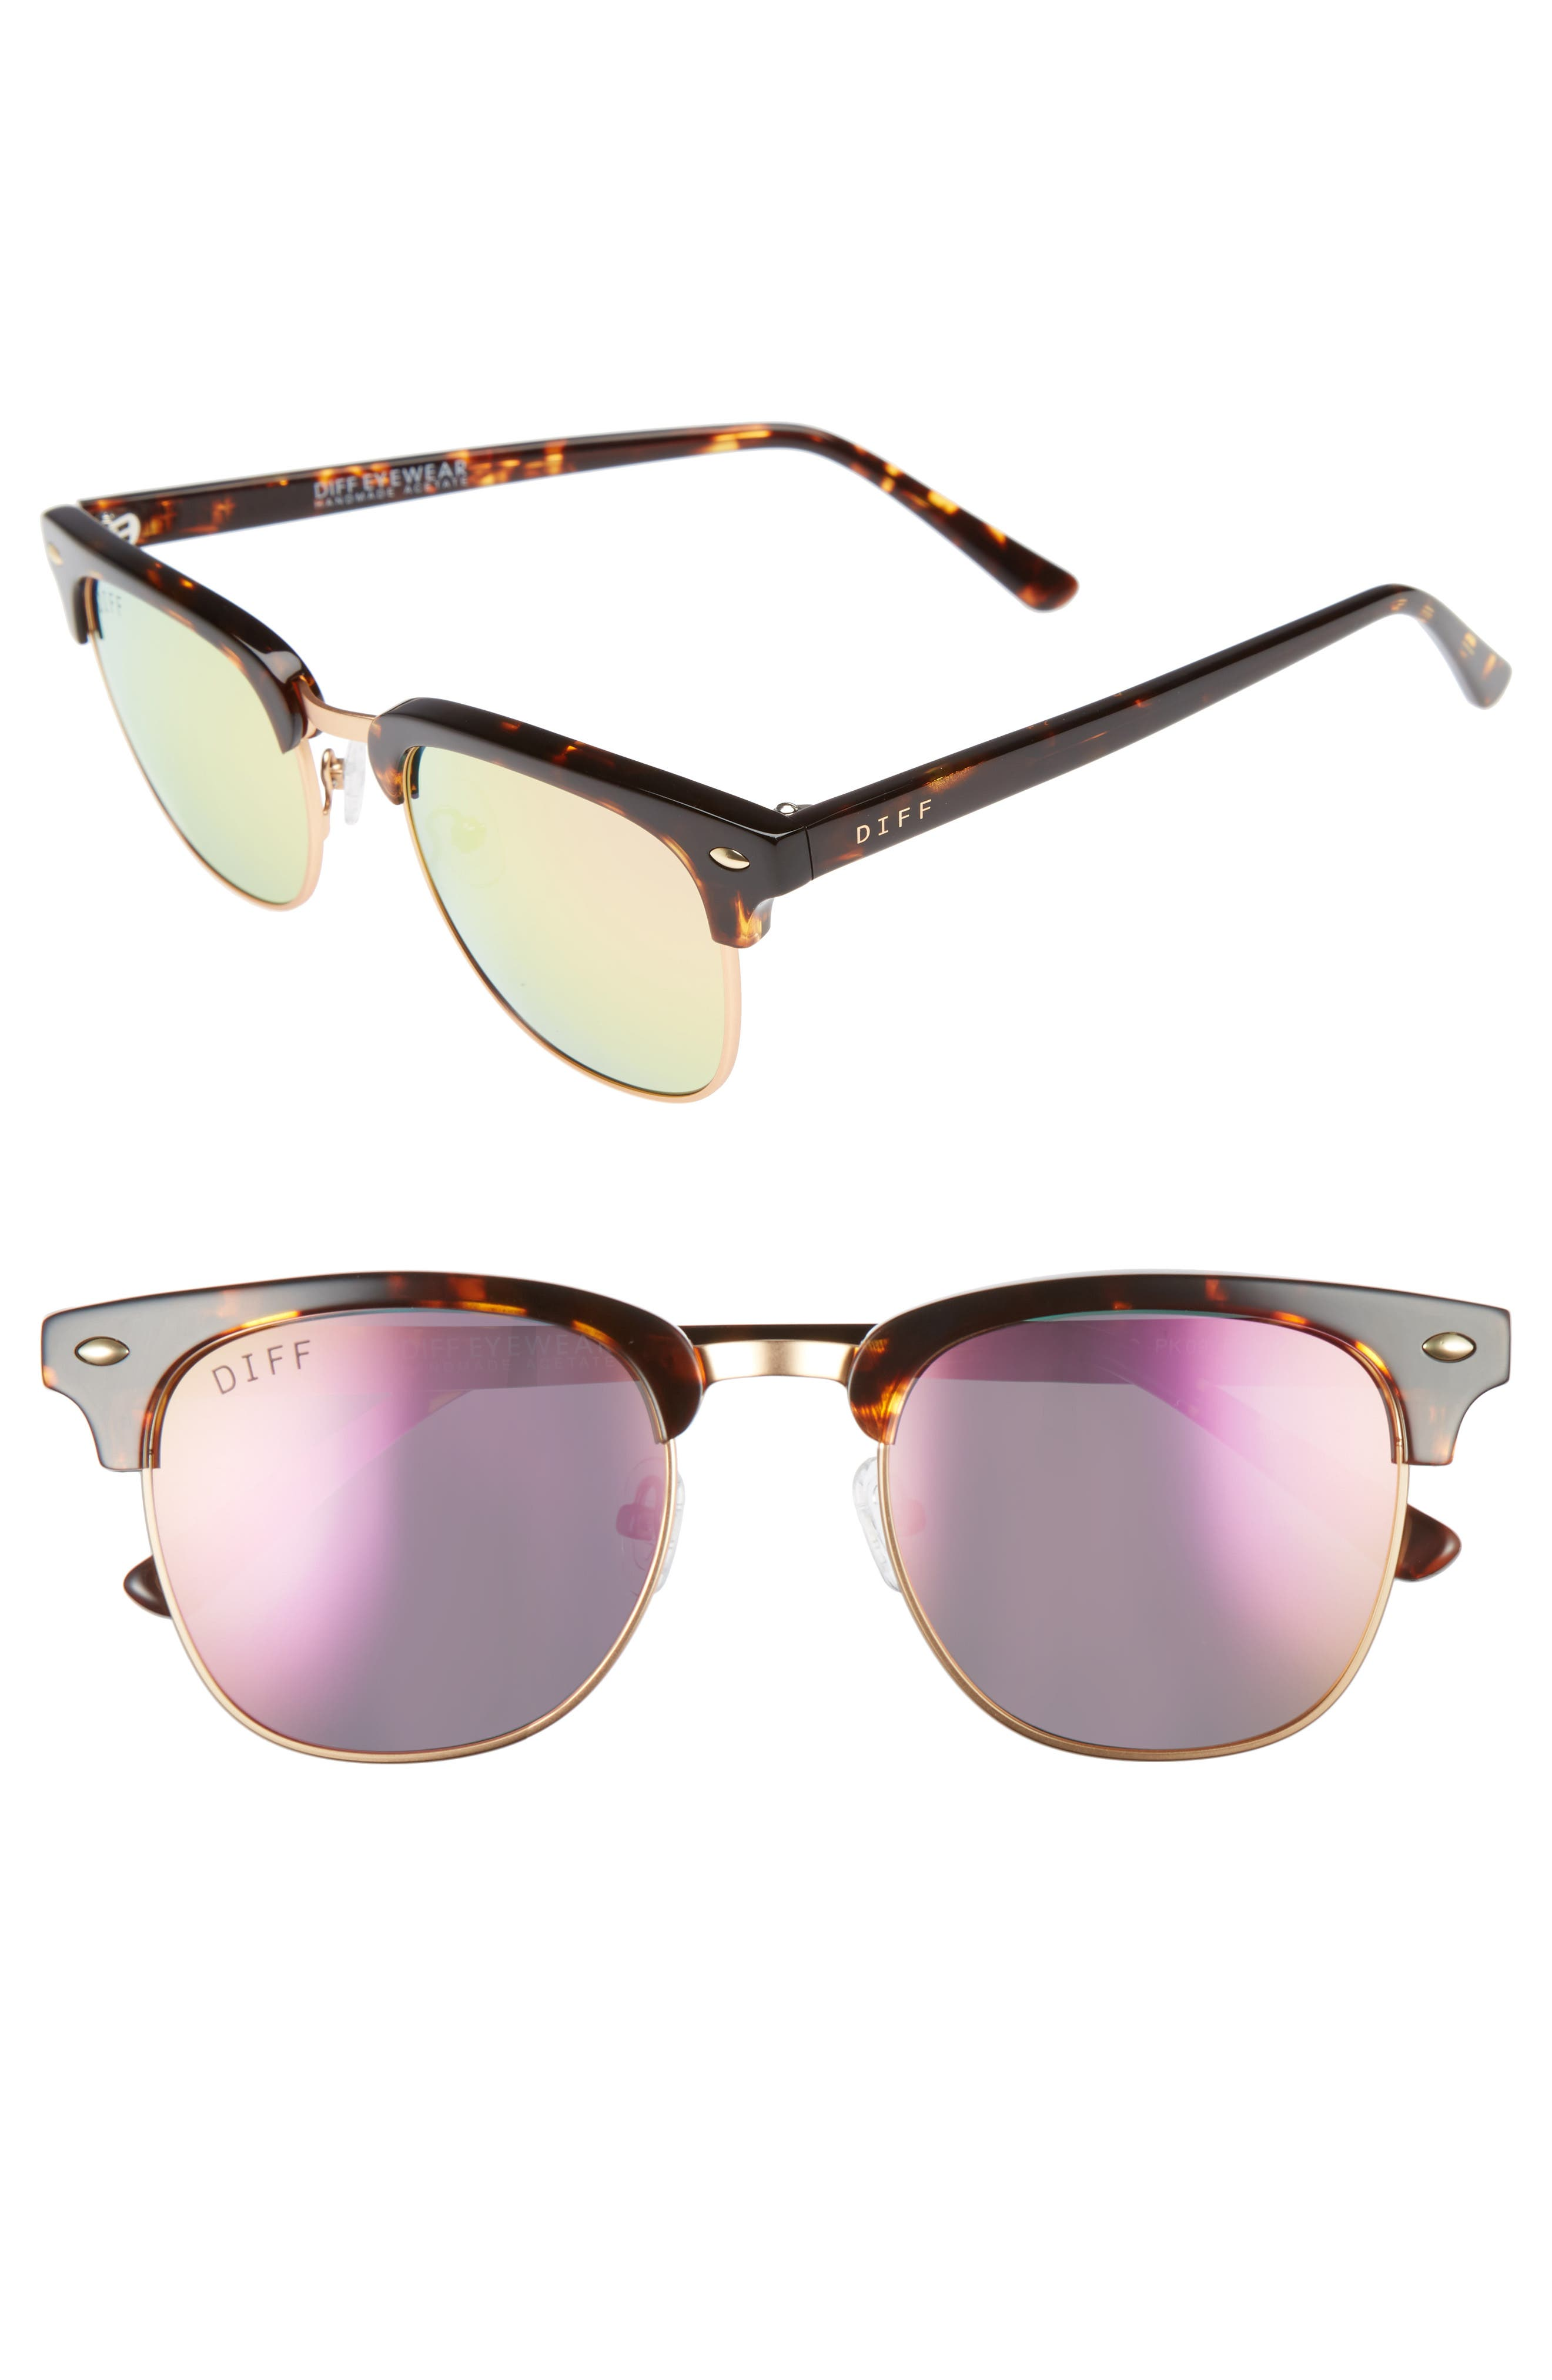 Barry 51mm Polarized Retro Sunglasses,                         Main,                         color, Tortoise/ Pink